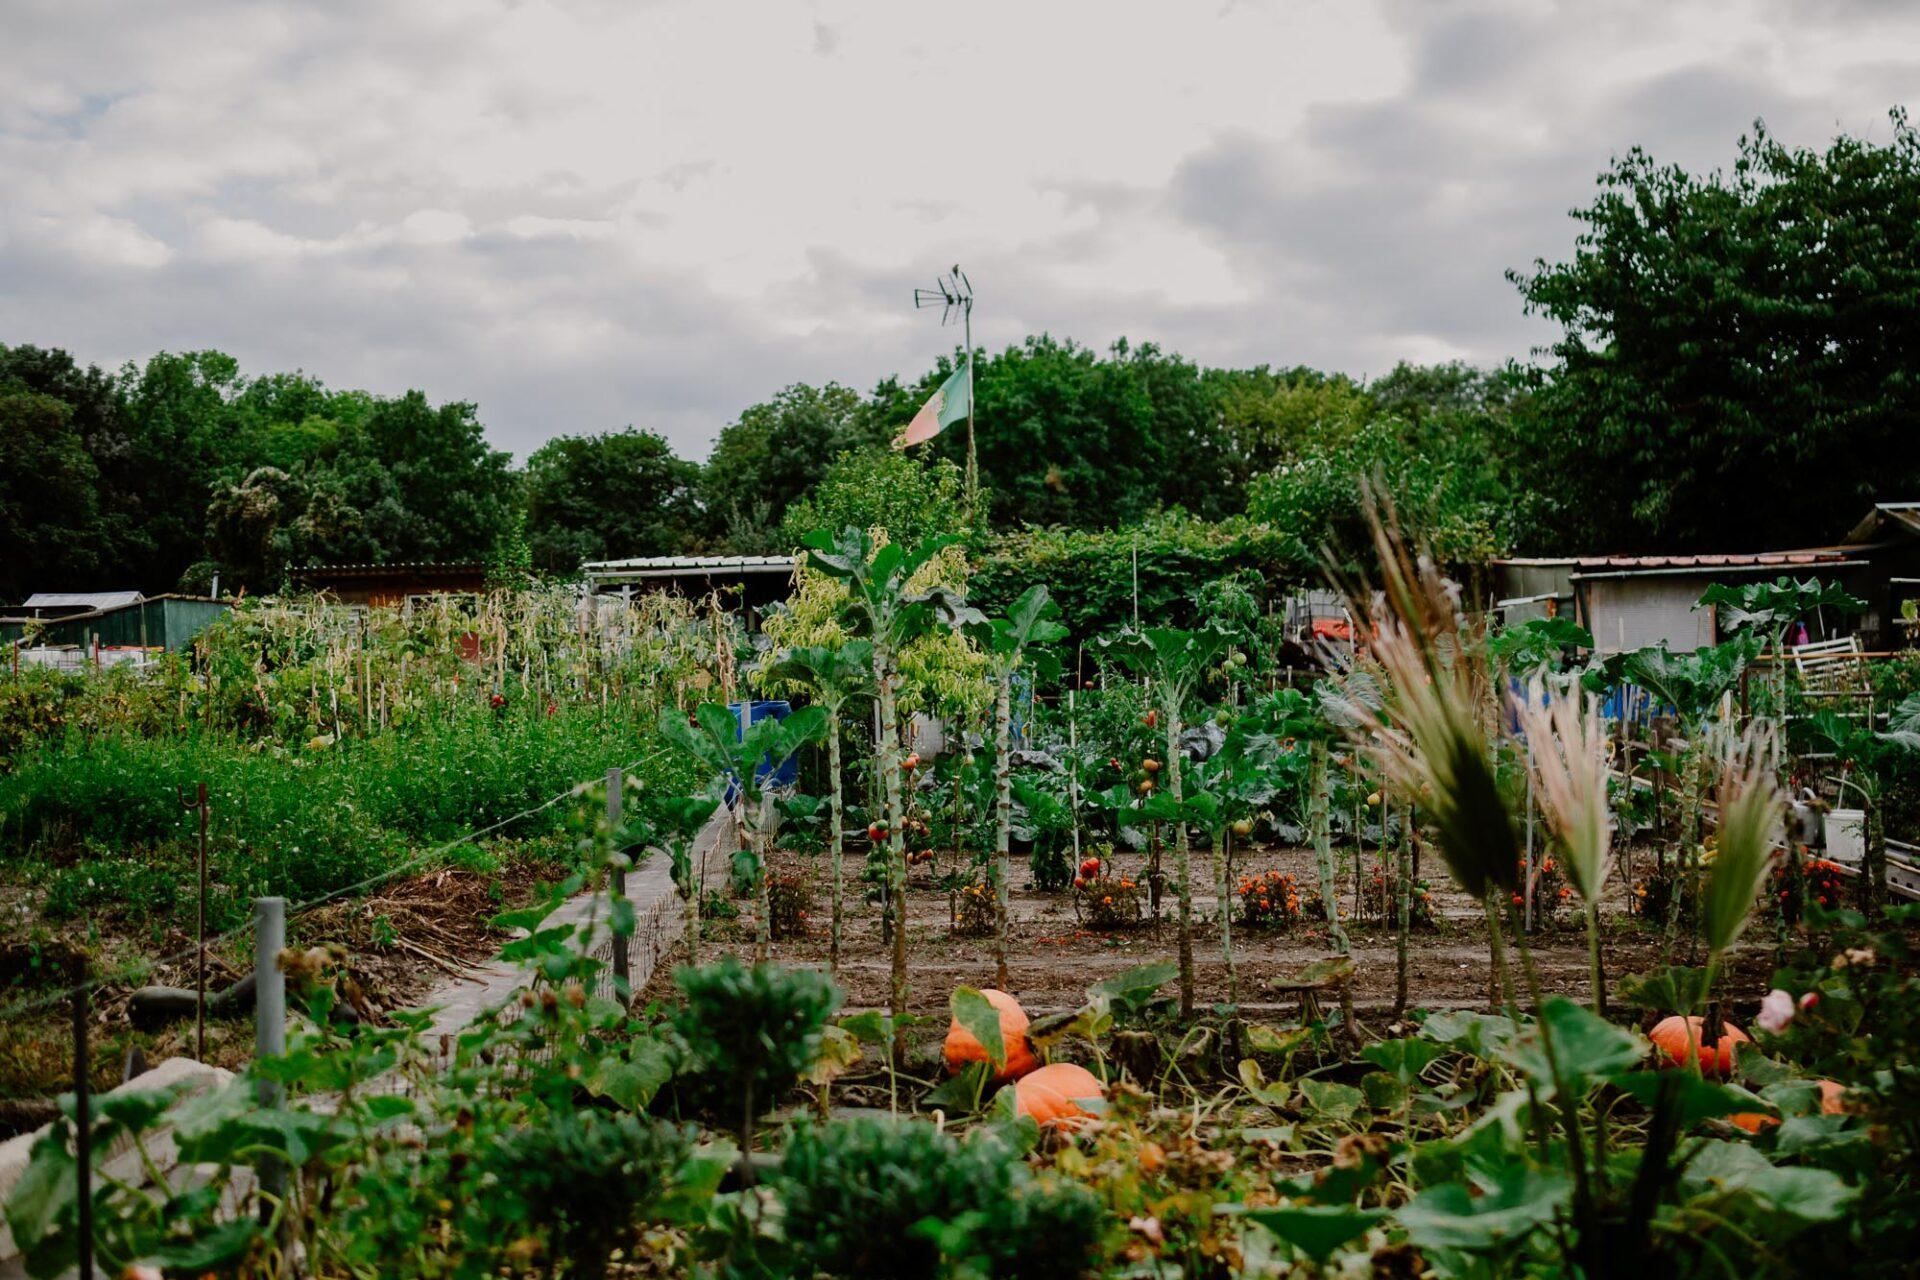 Jardins ouvriers aubervilliers 42 - Dagmara Bojenko - Eco-conscious Weddings, Births & Families